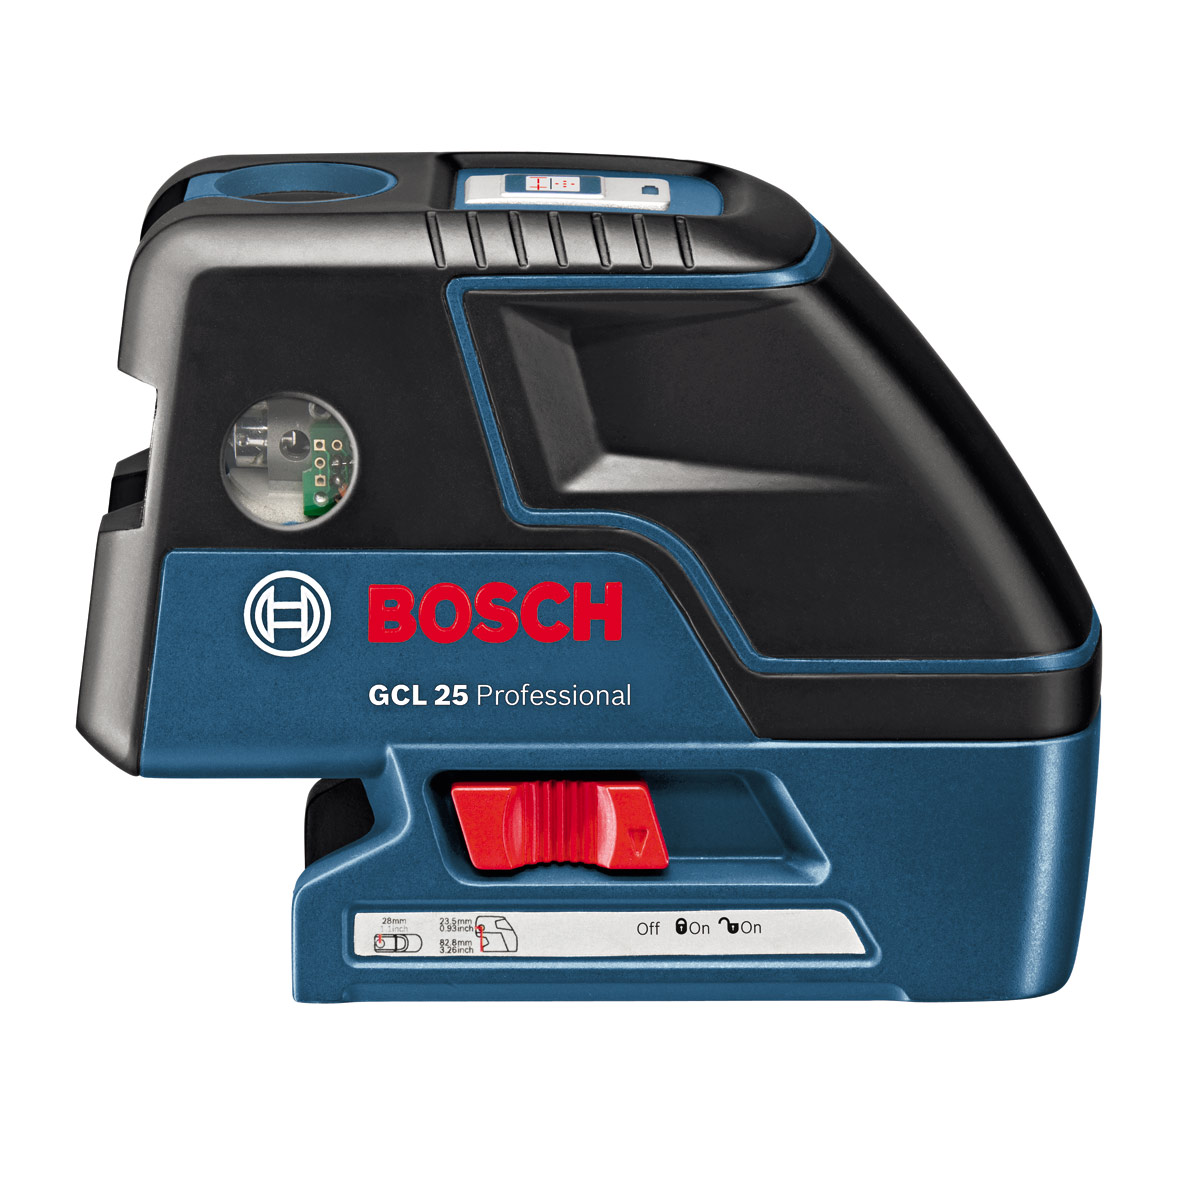 bosch gcl 25 professional point crossline laser. Black Bedroom Furniture Sets. Home Design Ideas